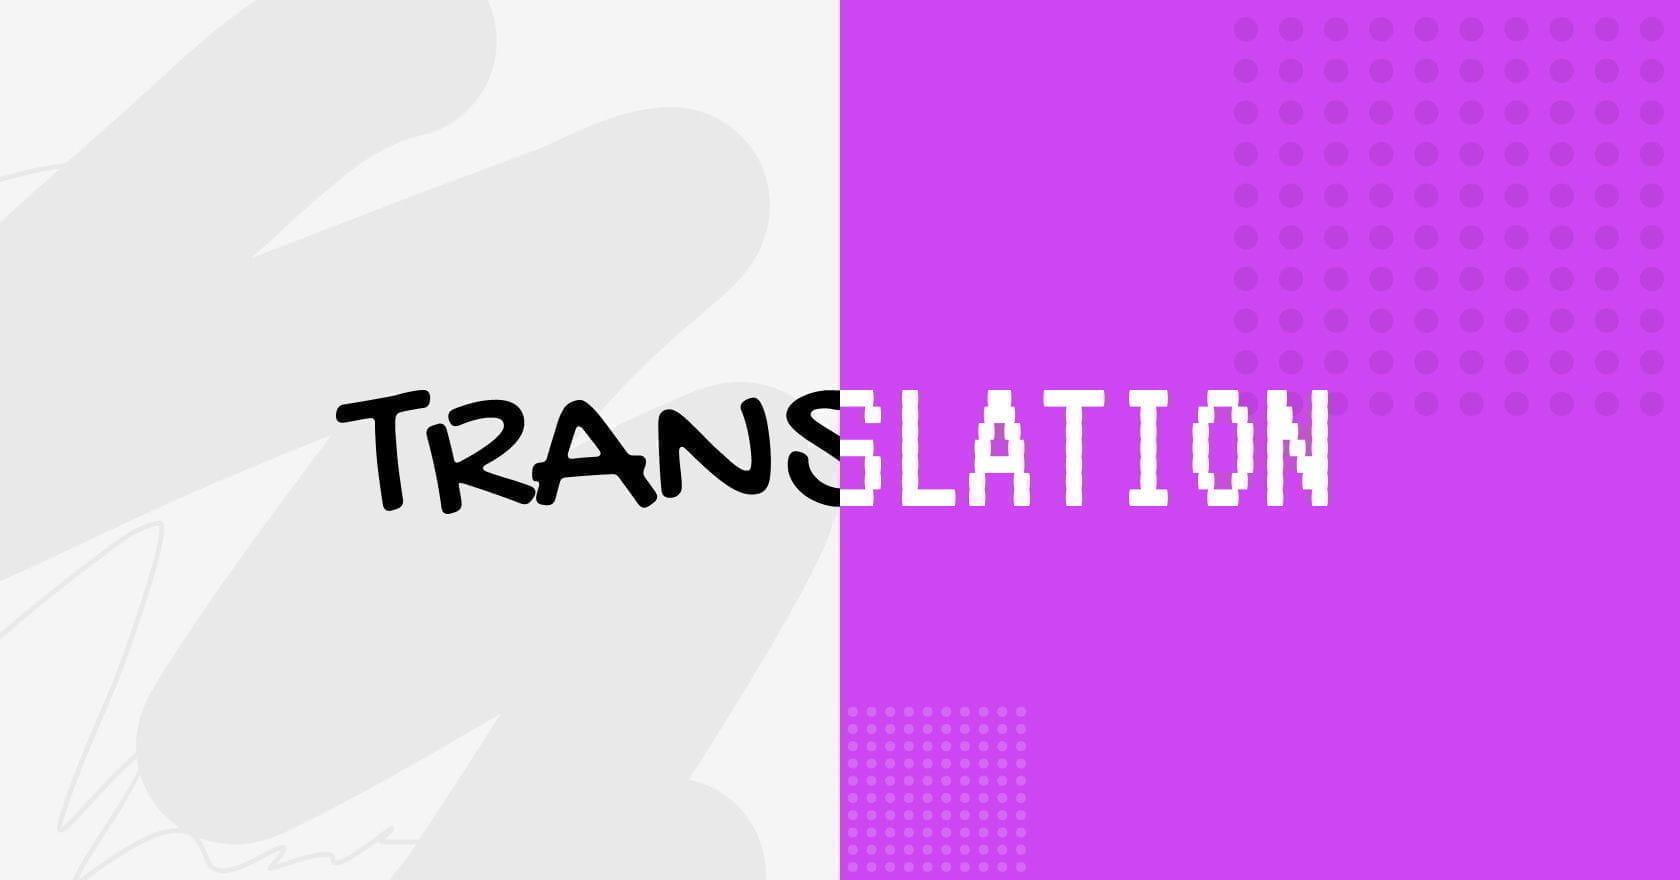 machime_vs_human_translation_@2x-1